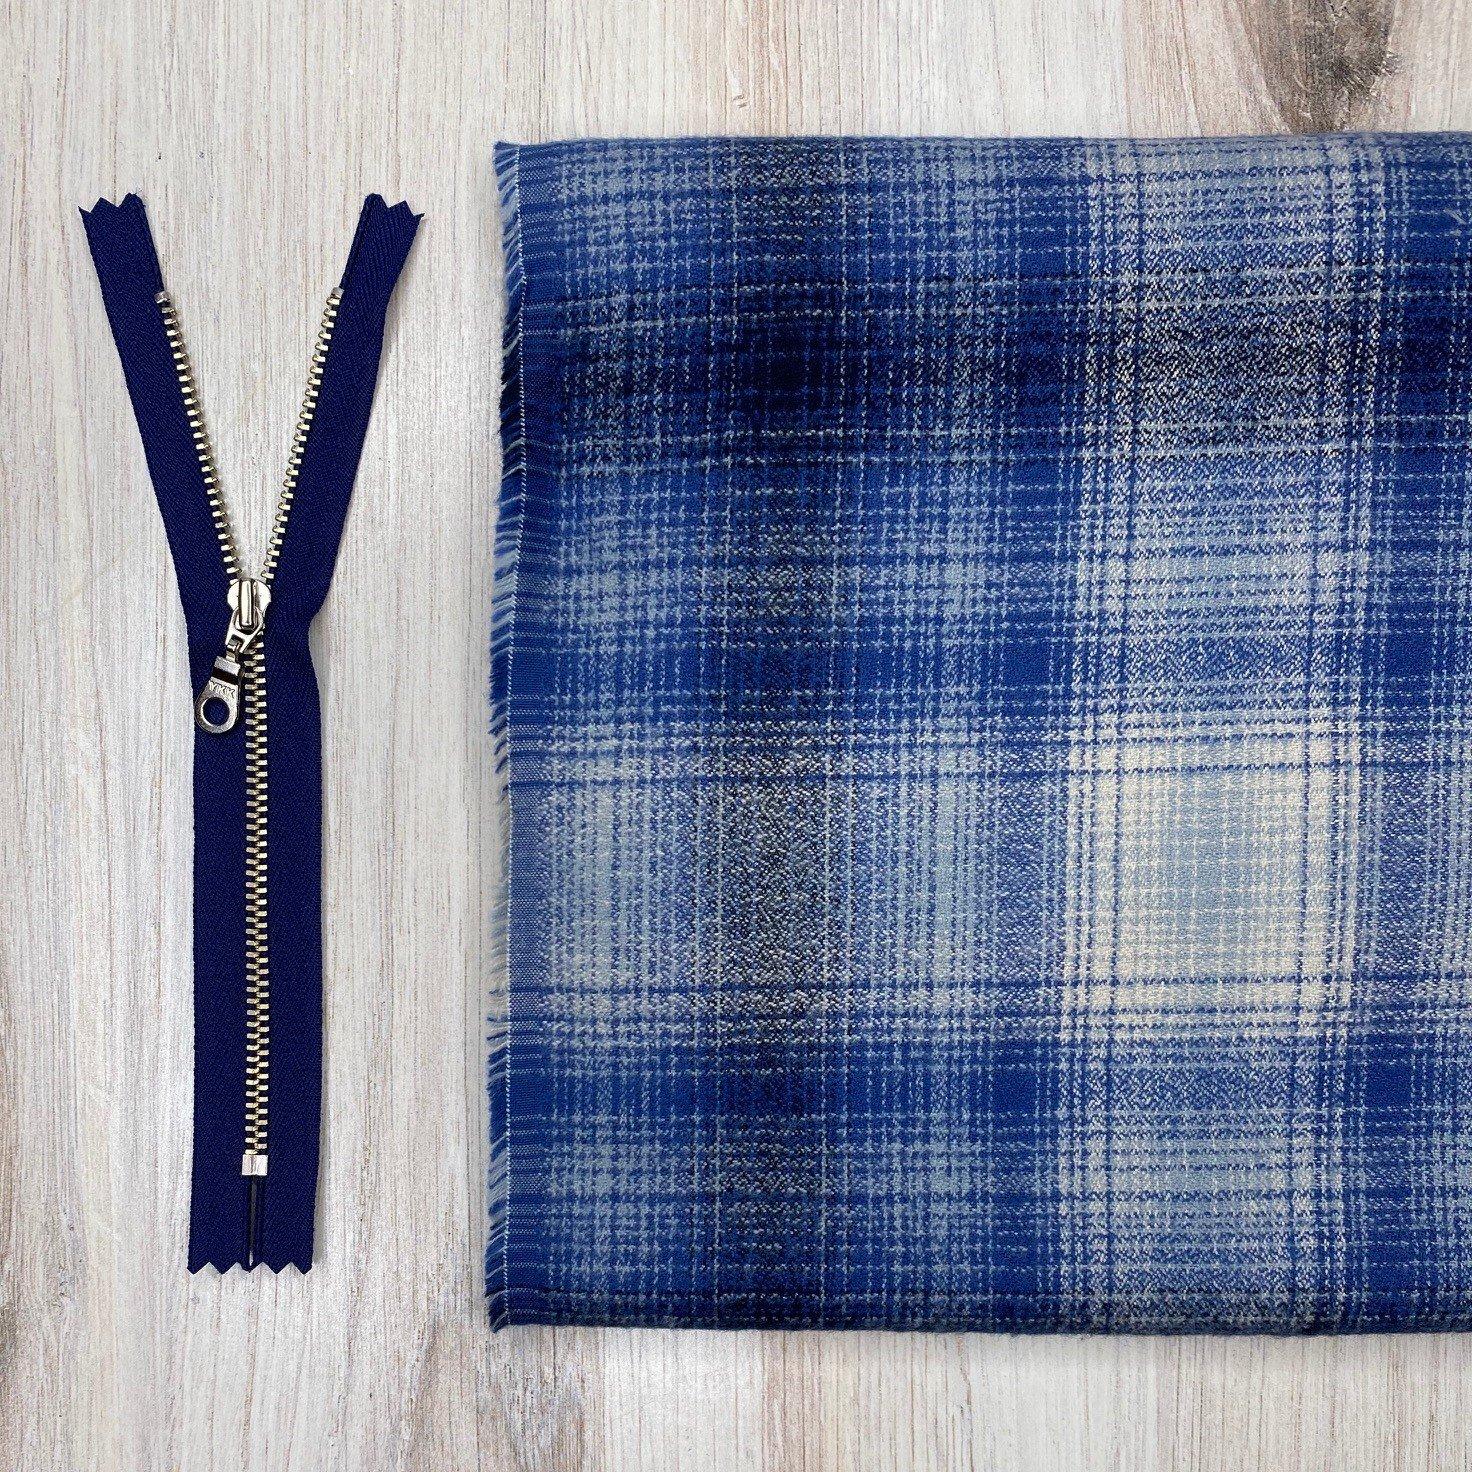 Sideline Scarf Kits